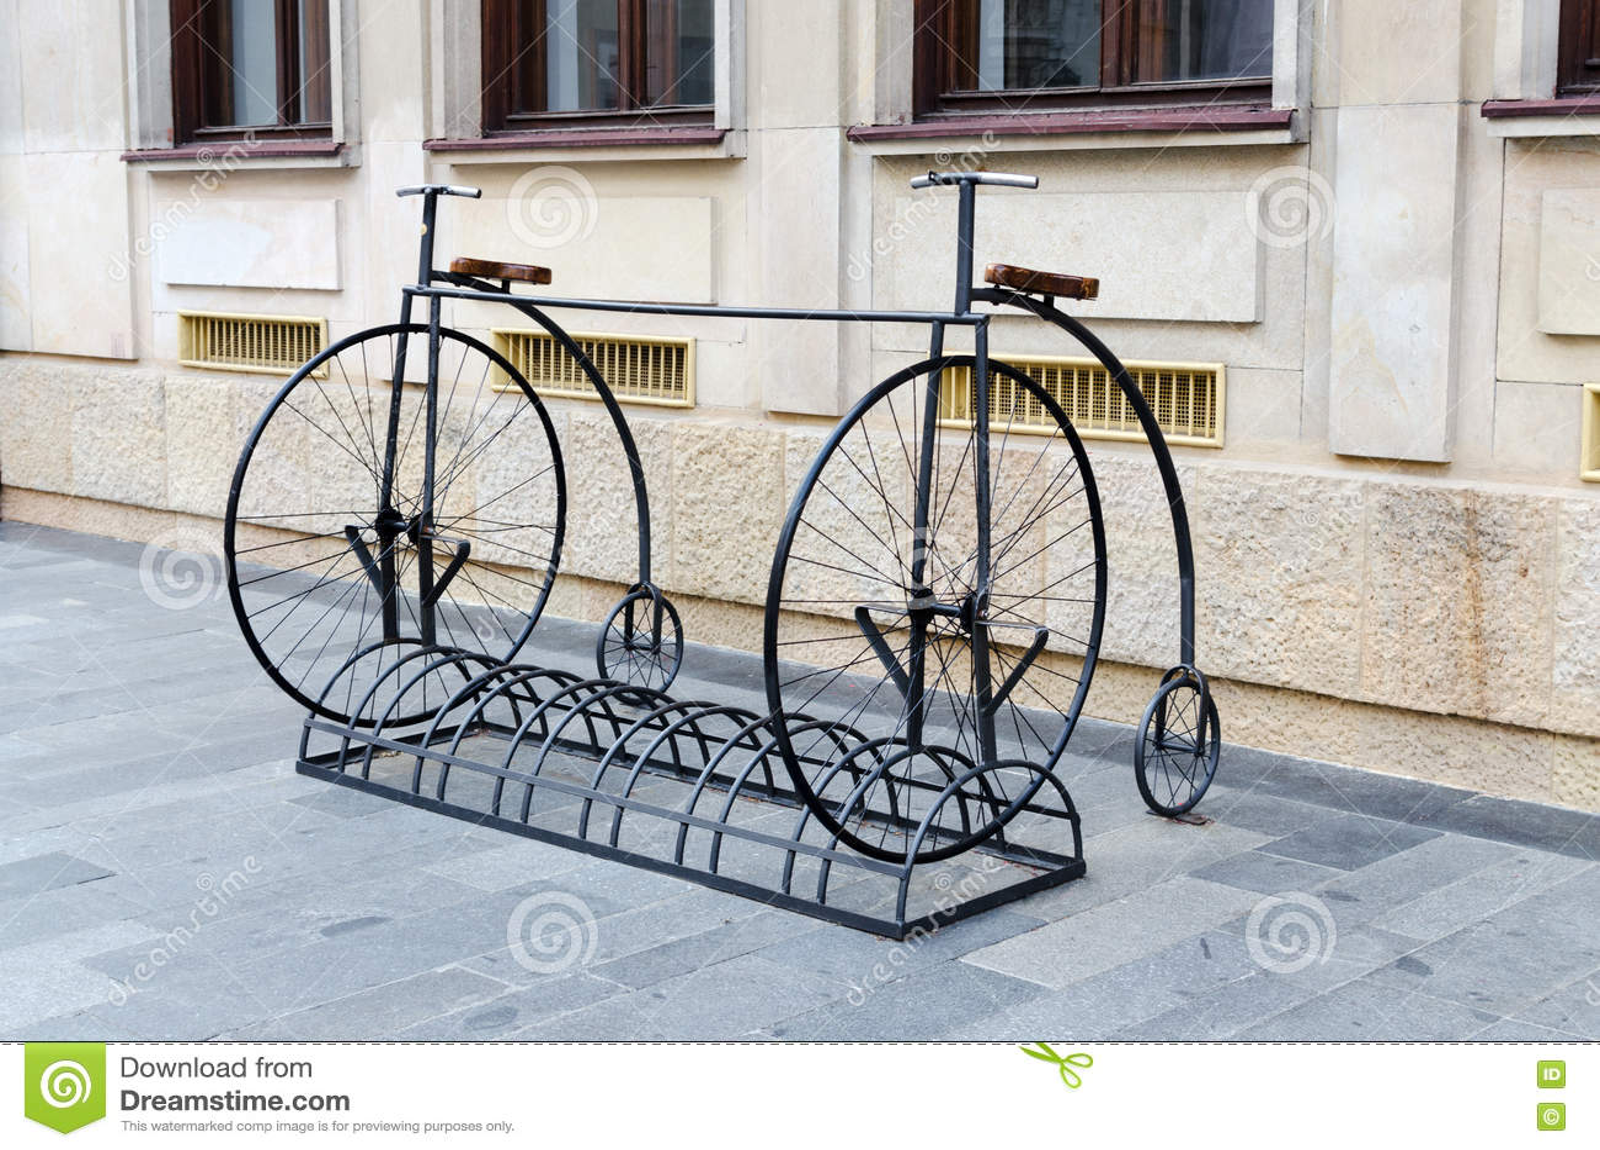 Bike Stand In Penny Farthing Design Bratislava Stock Photo